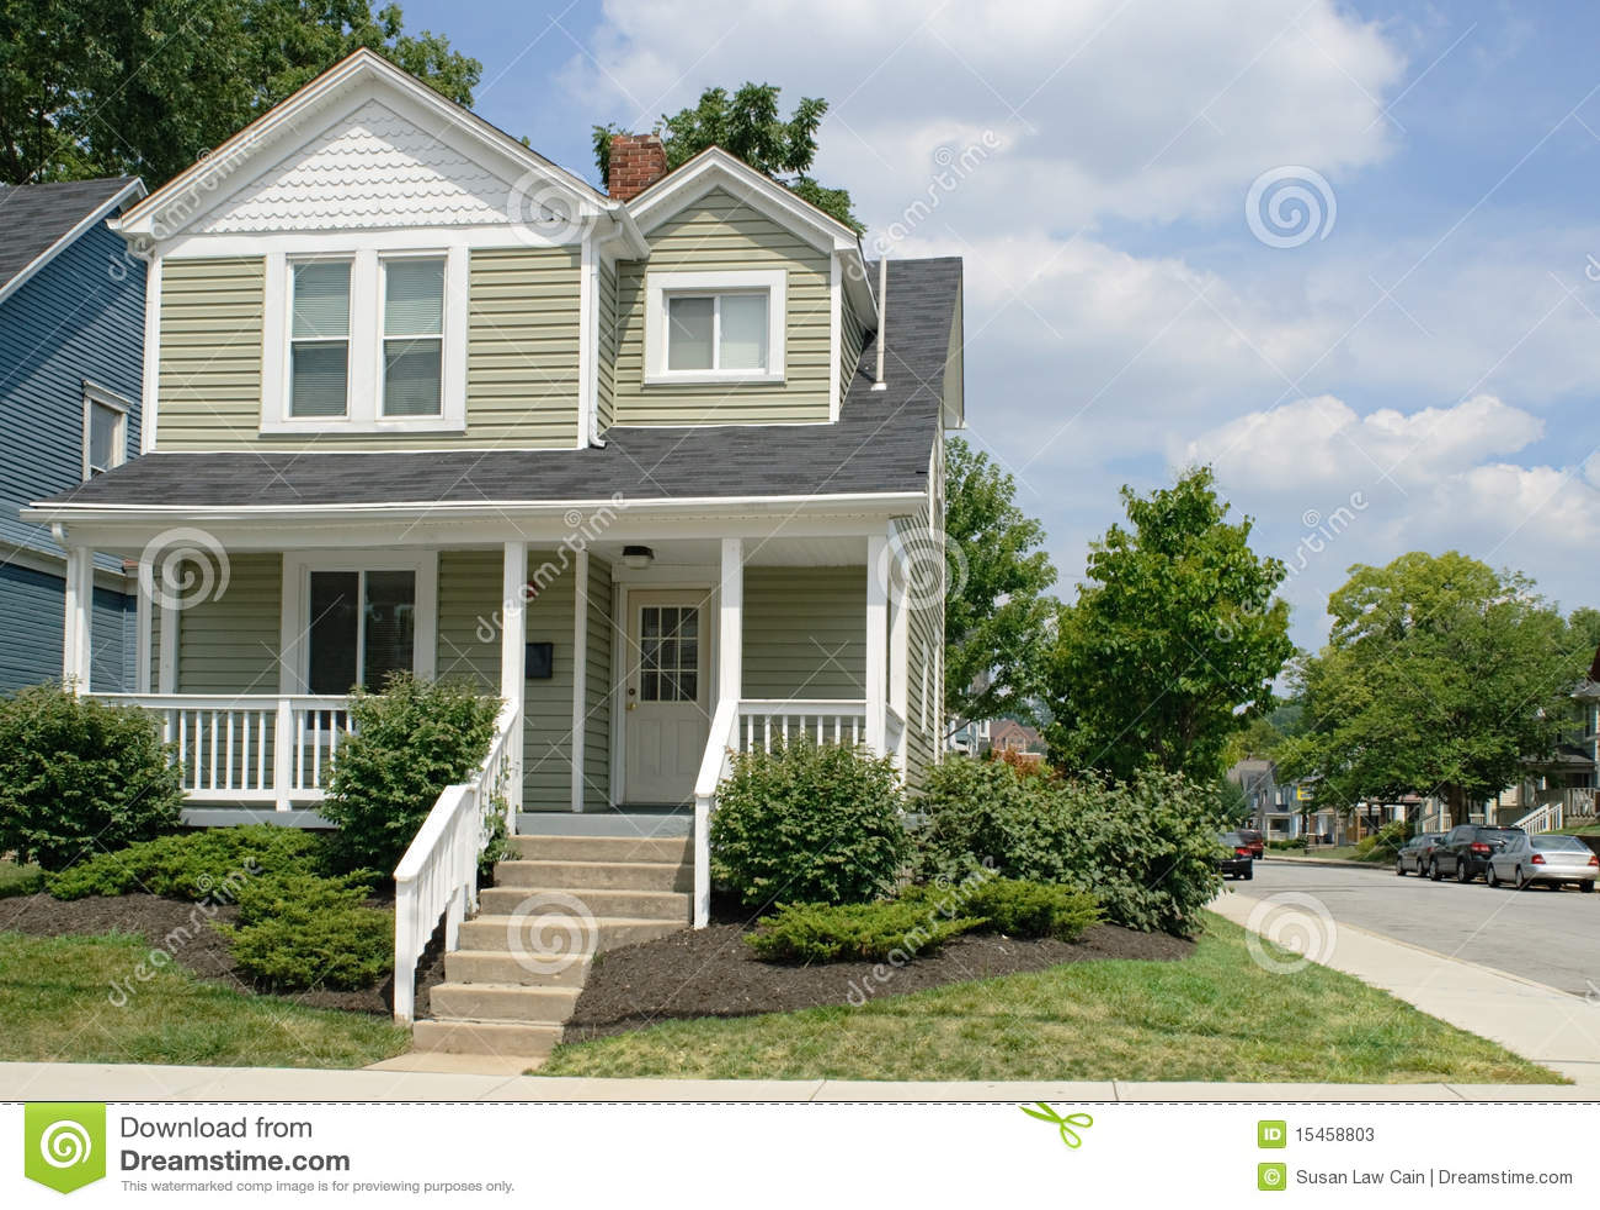 House on Corner